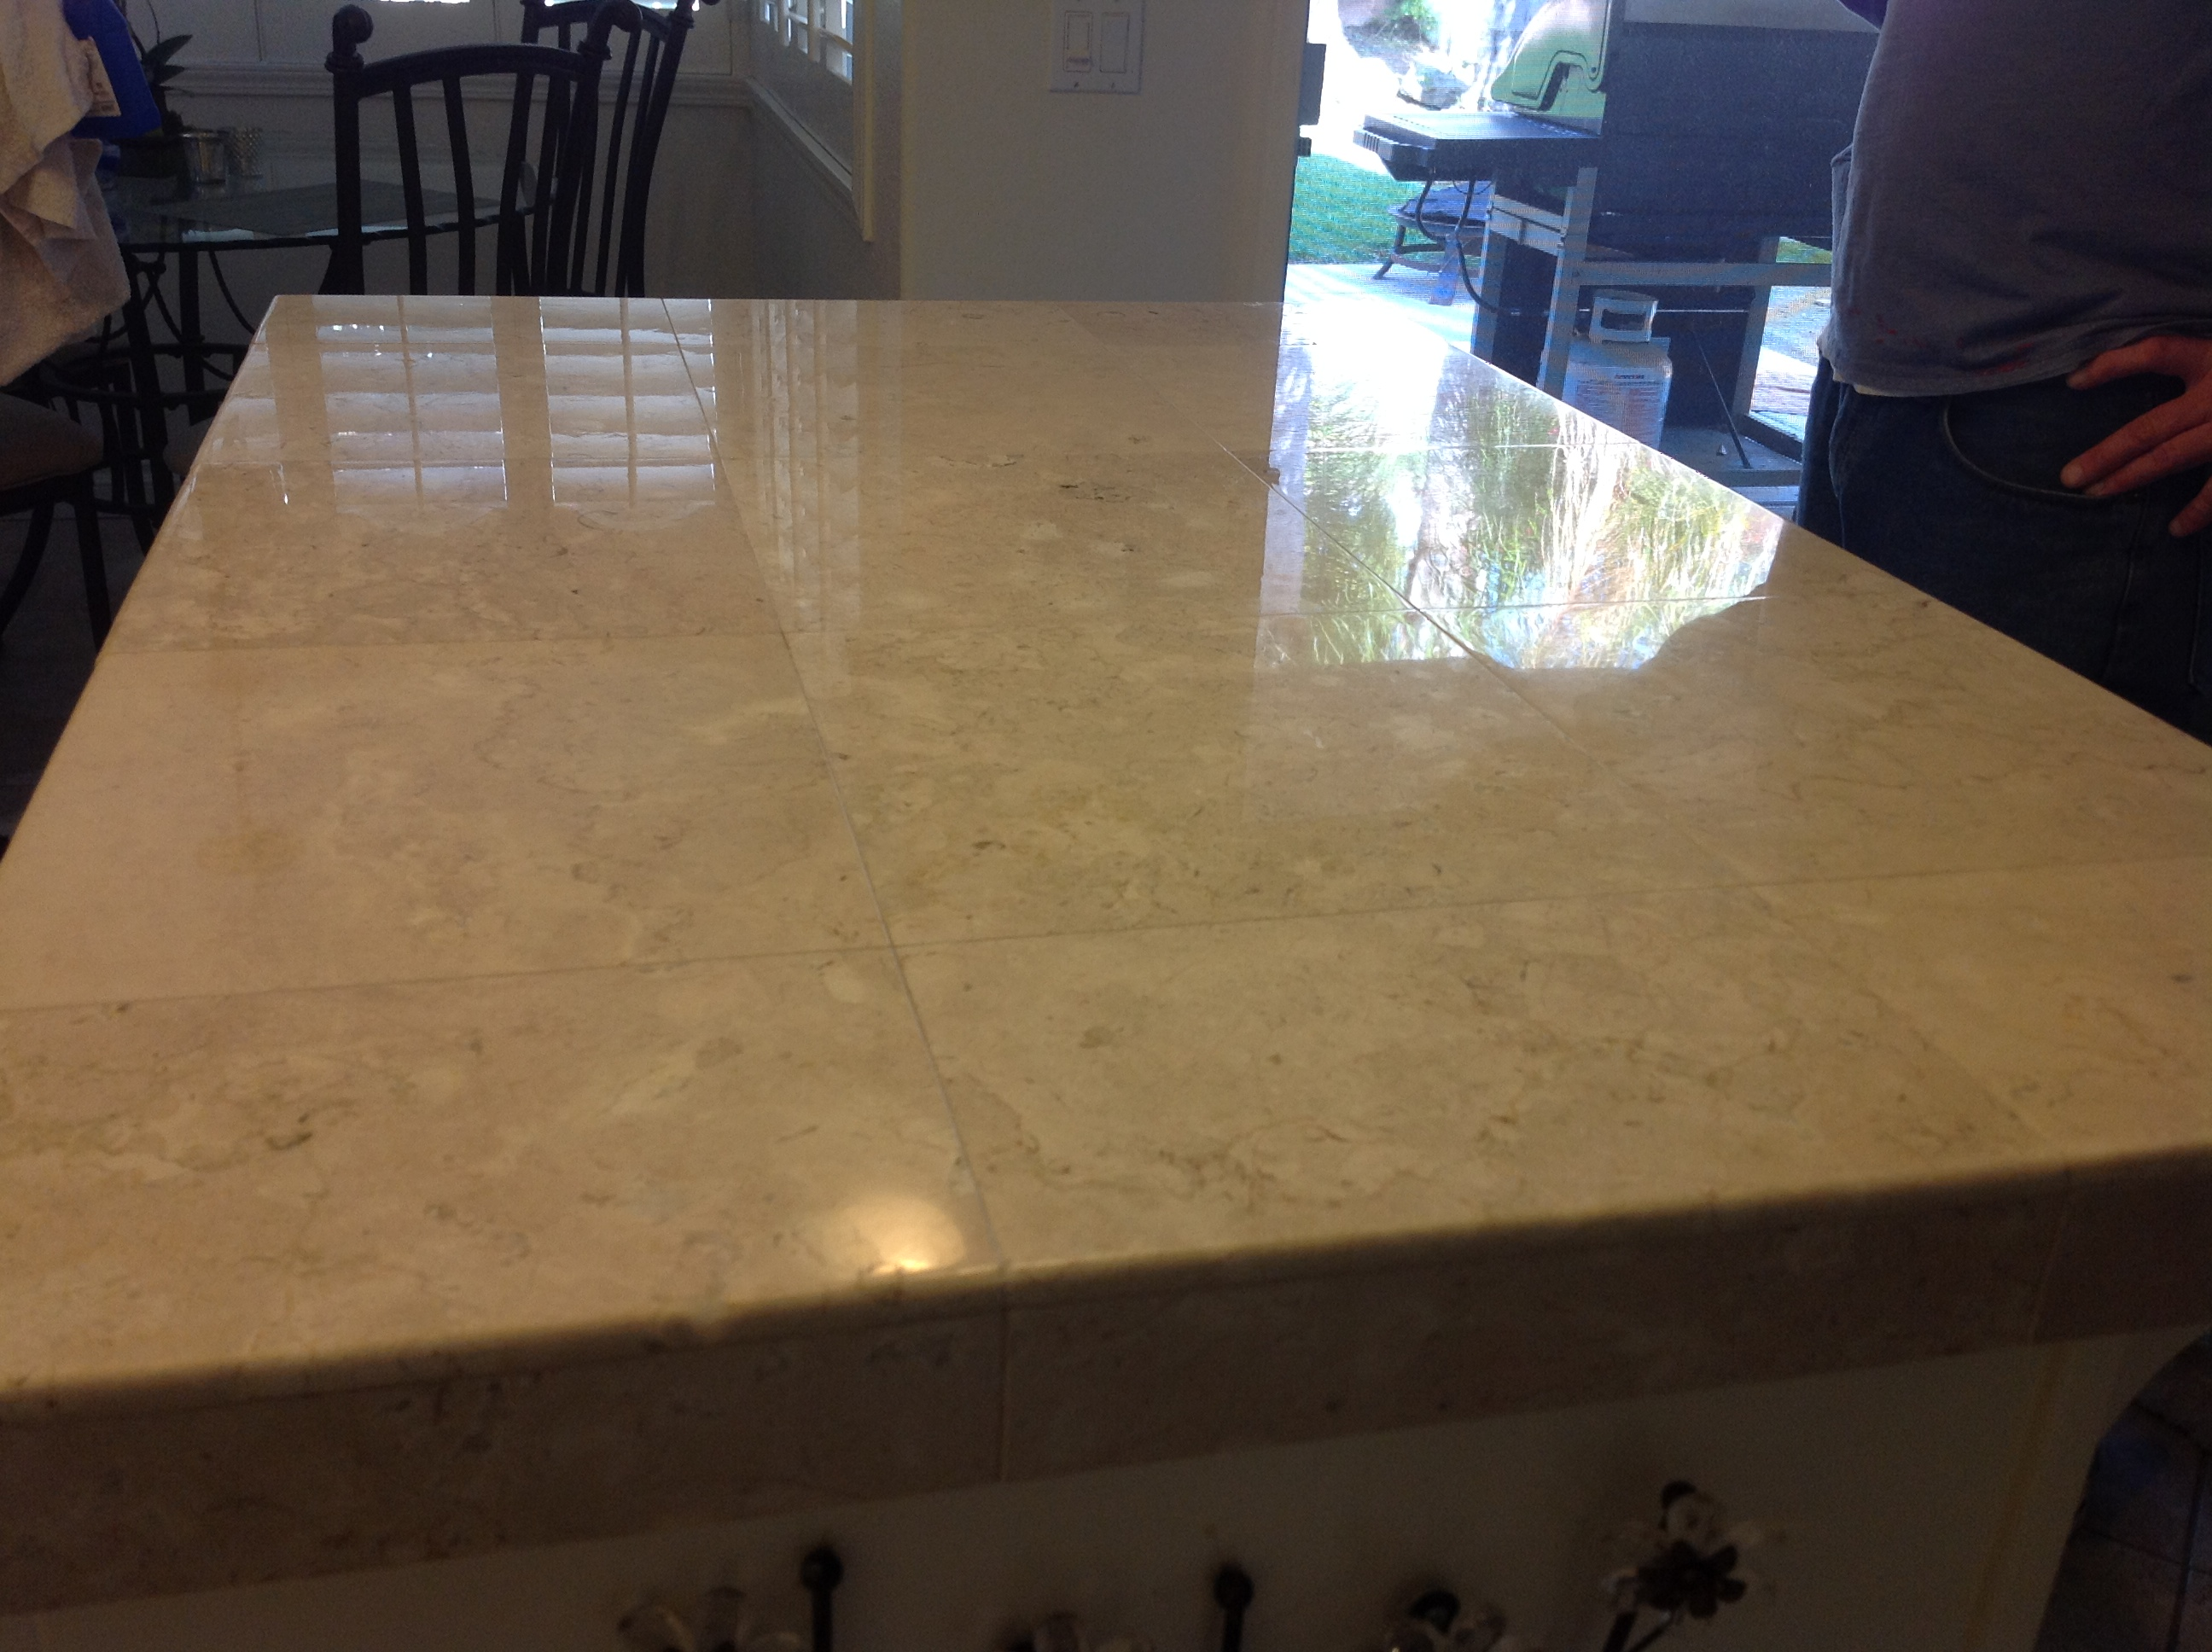 San francisco marble tile countertop polishing grout cleaning polished marble countertop shiny marble tiles marble cleaning san francisco shiny marble countertop sf dailygadgetfo Choice Image